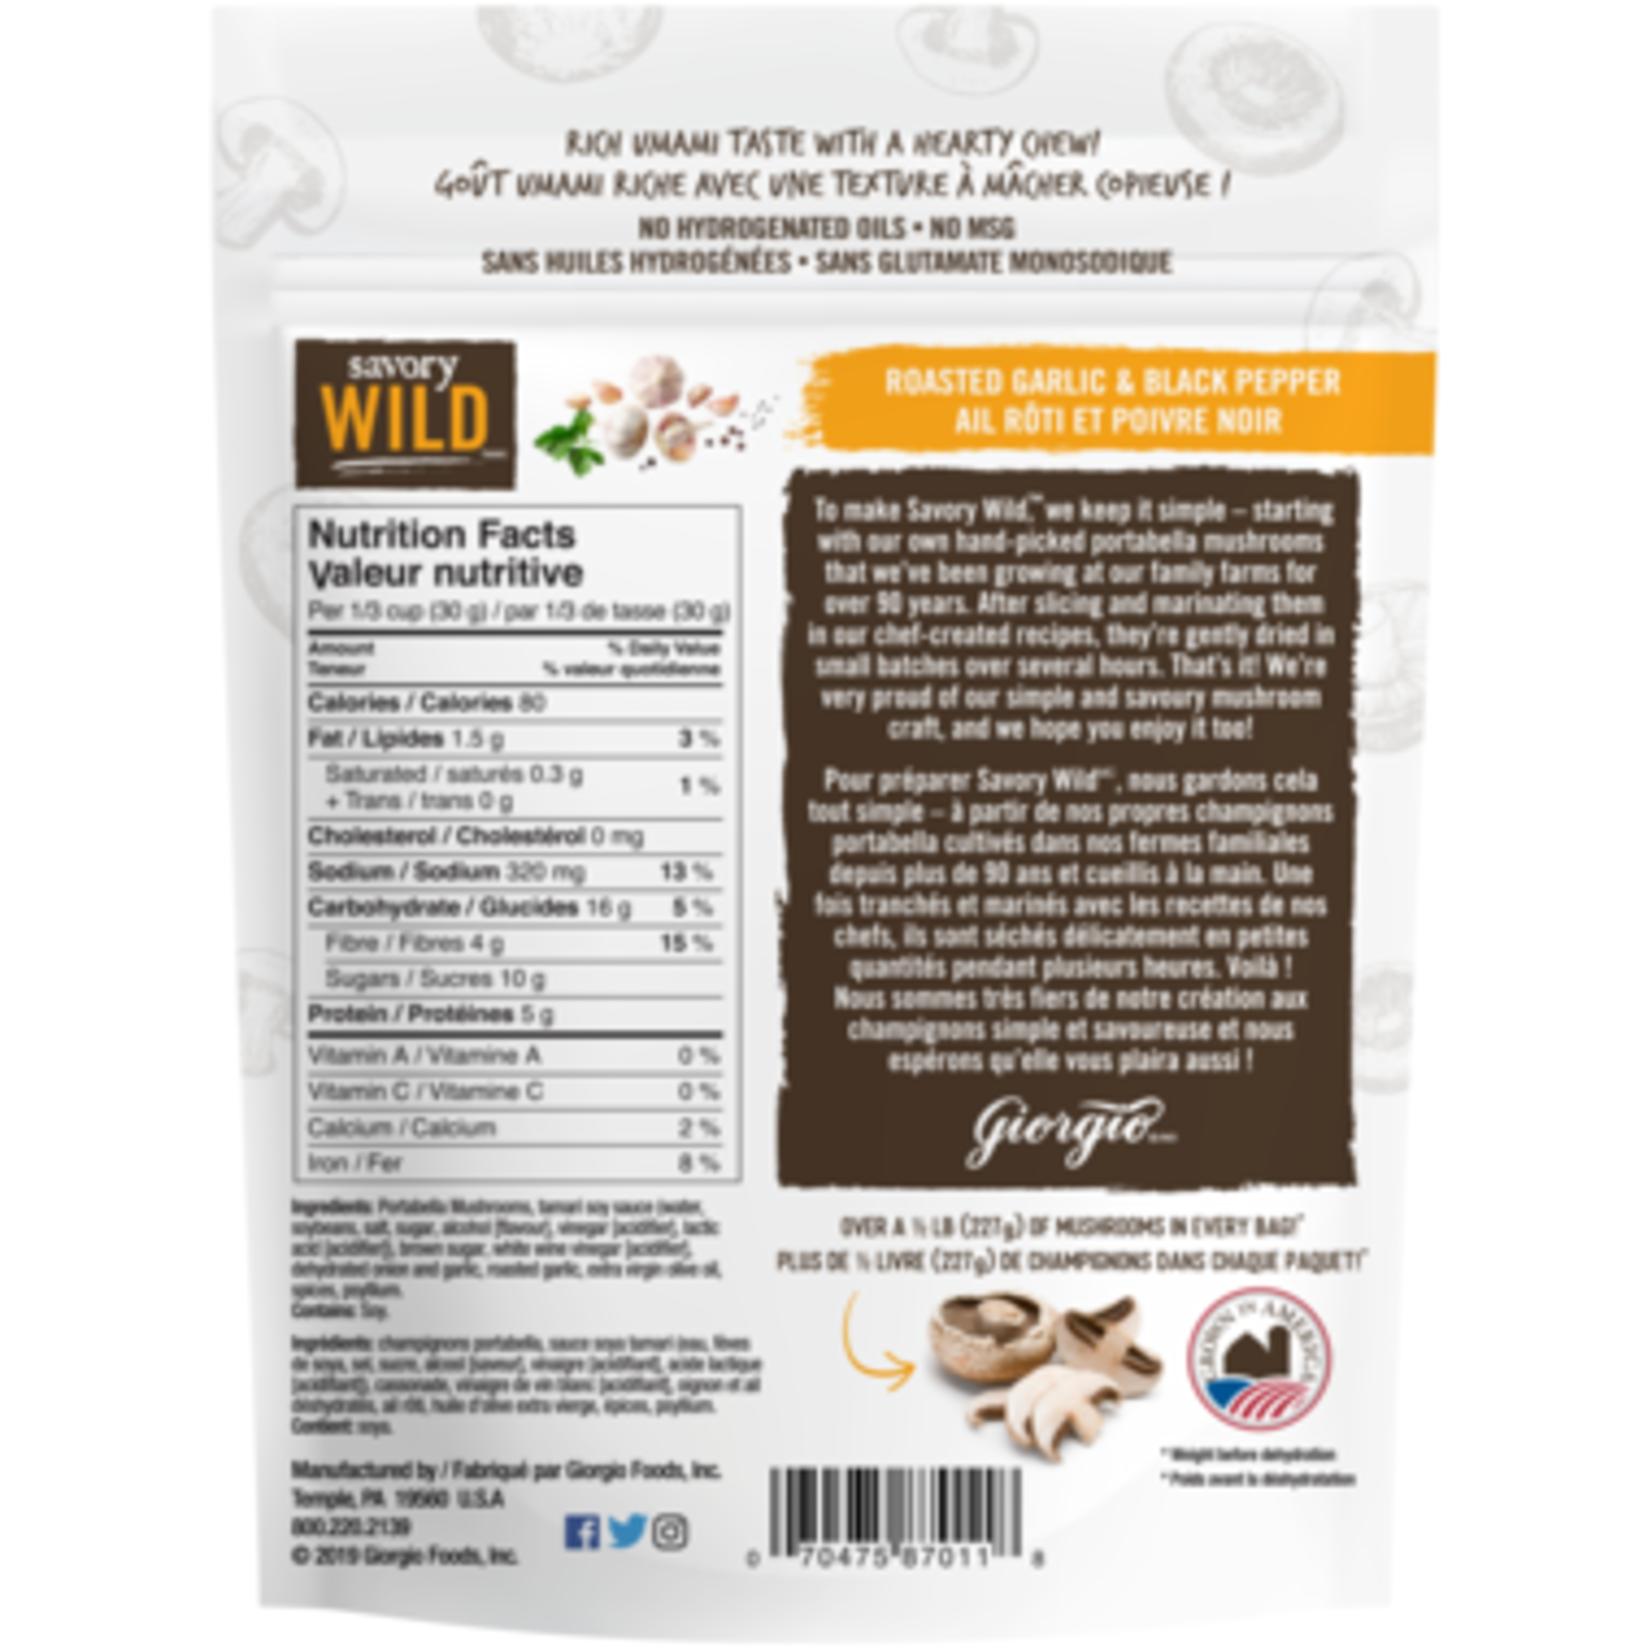 Savory Wild Portabella Mushroom Jerky - Roasted Garlic and Black Pepper 57g